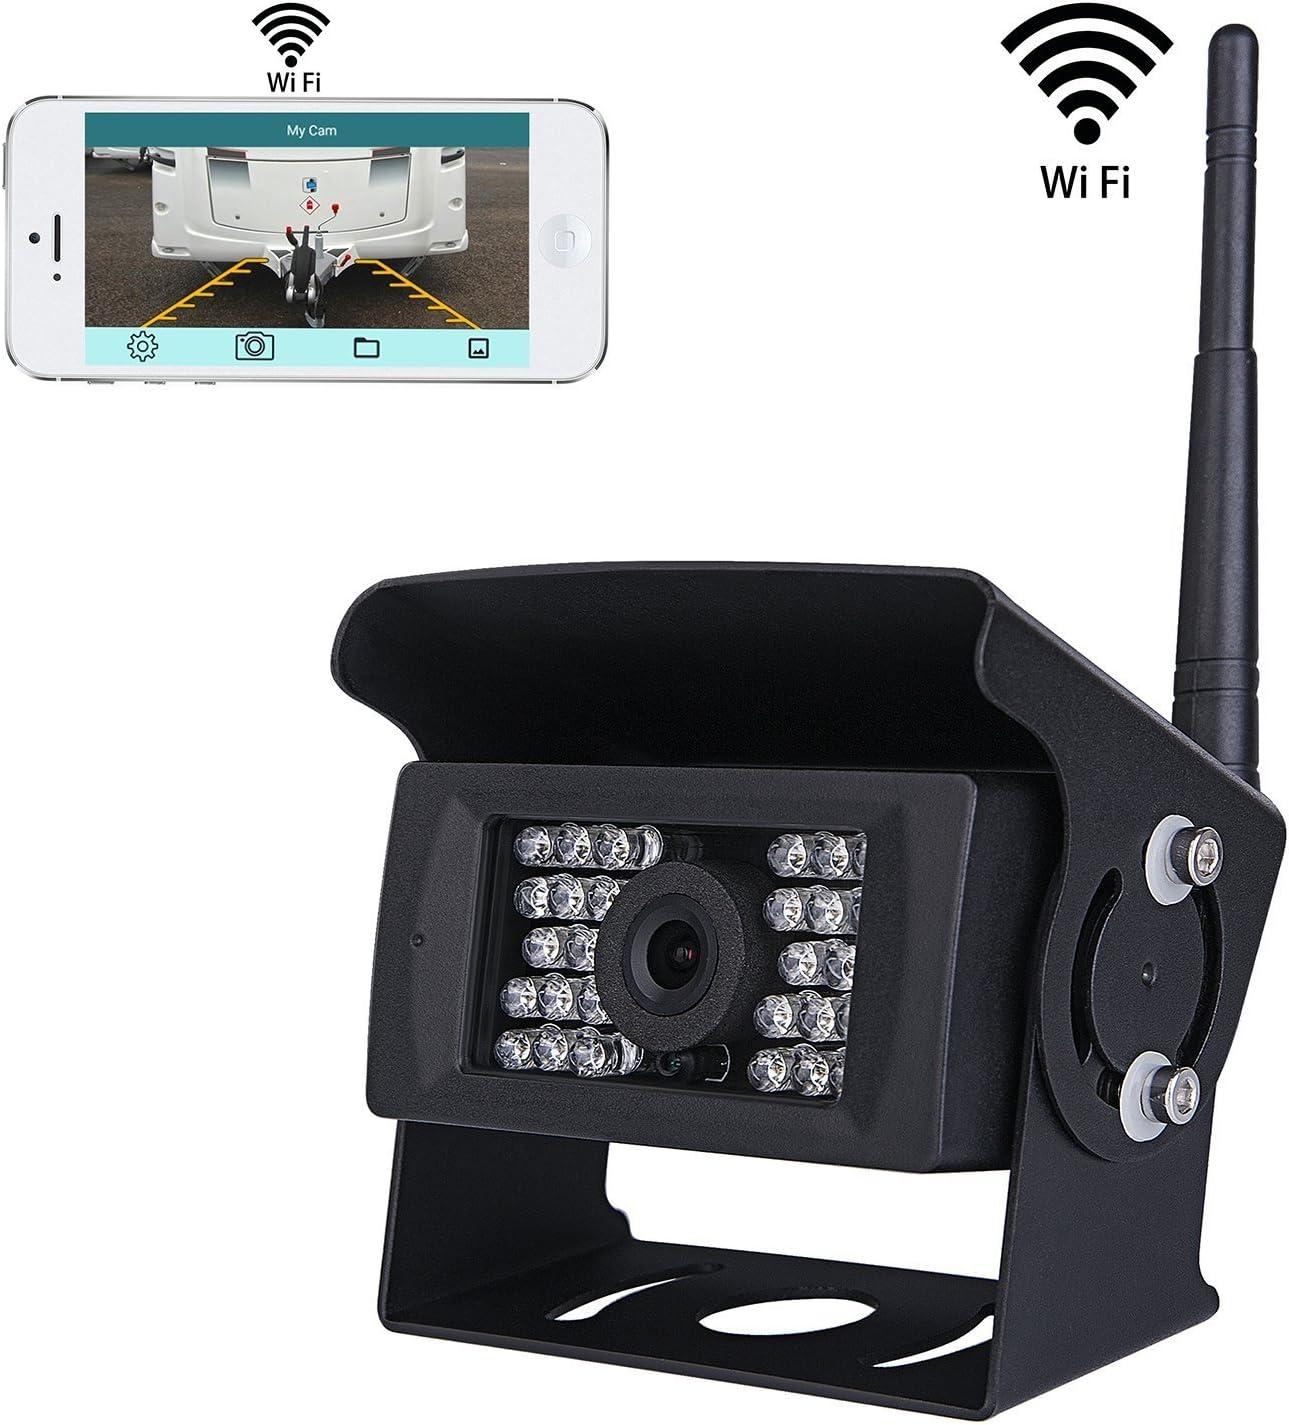 Wifi - Cámara de Marcha Atrás Inalámbrica con Sistema CCTV, 36 V a 12 V IP69 Impermeable 28 luces de Infrarrojos Visión Nocturna , Compatible con iPhone/iPad / Android ,para Remolque/ RV/Camiones